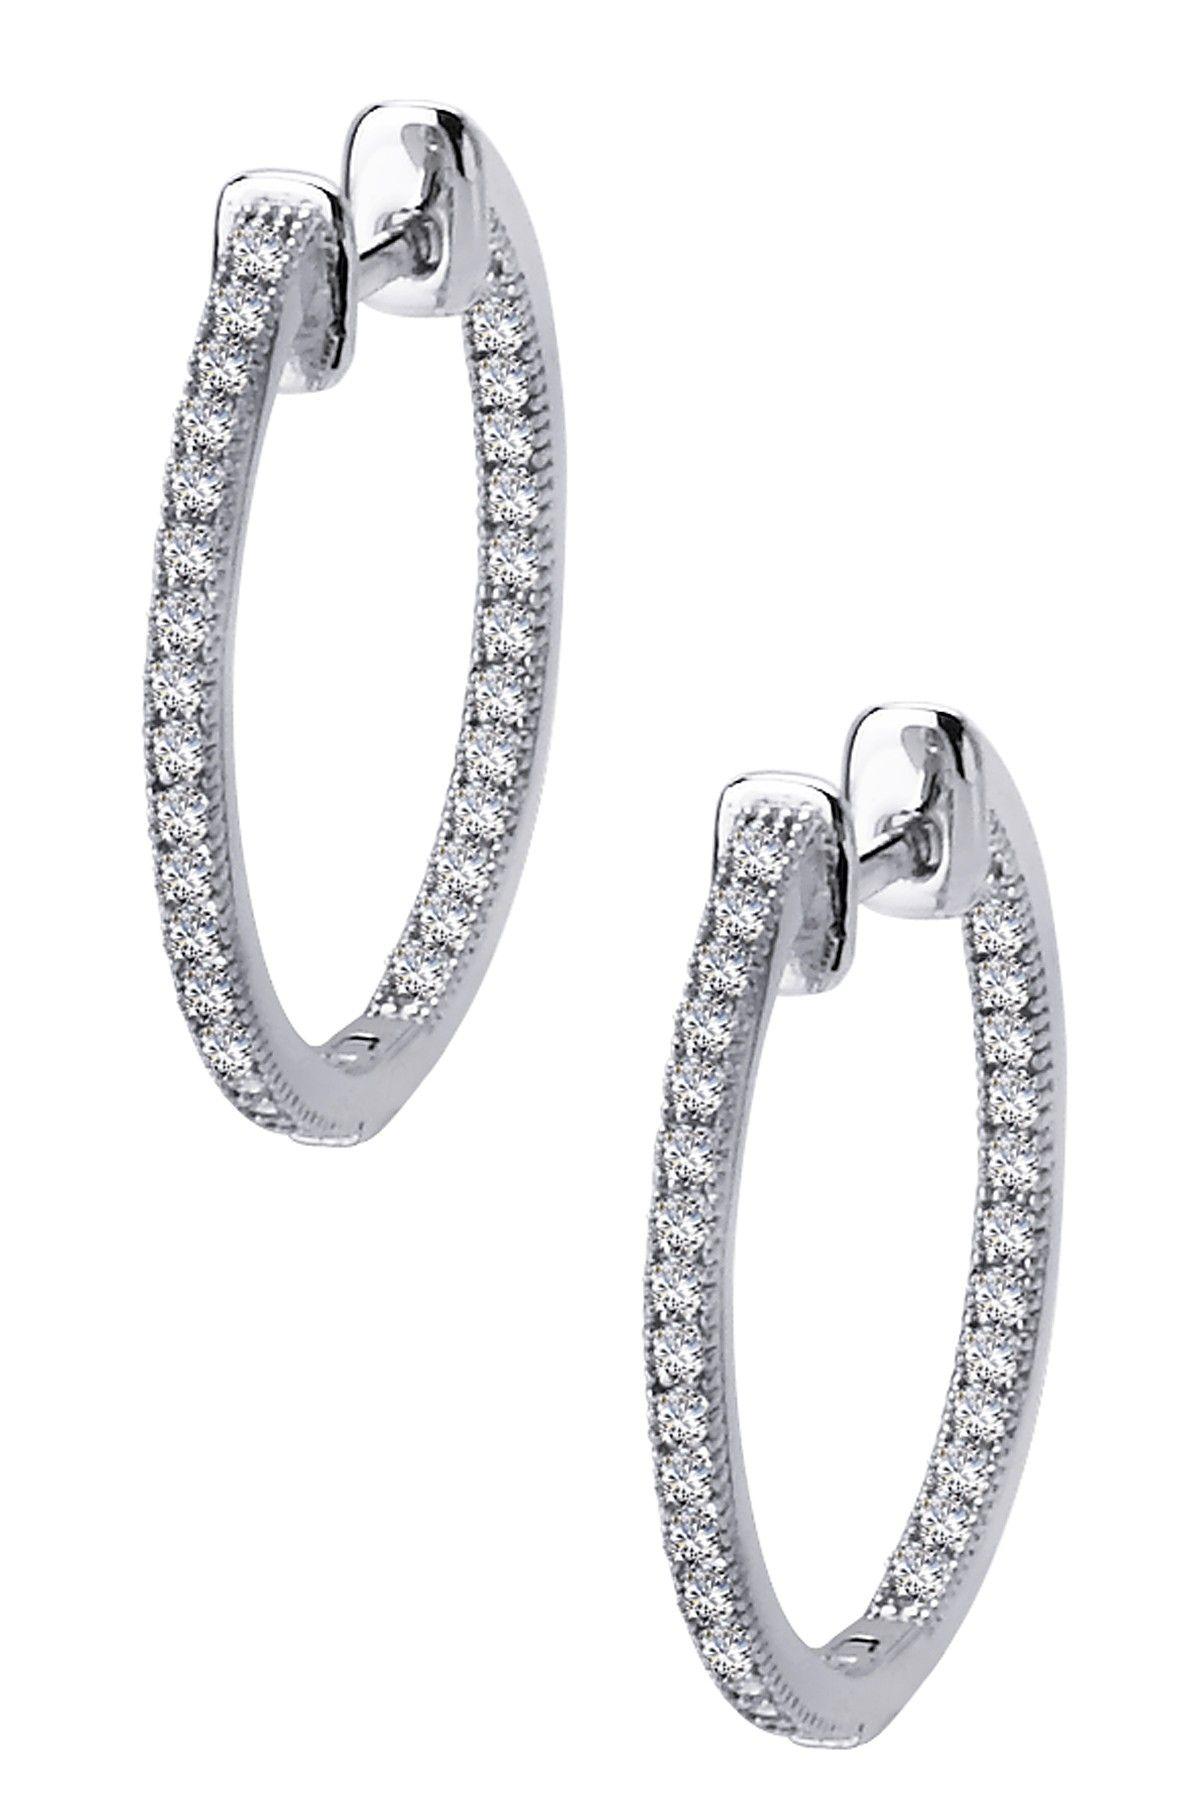 Lafonn Micro Pave Simulated Diamond Hoop Earrings